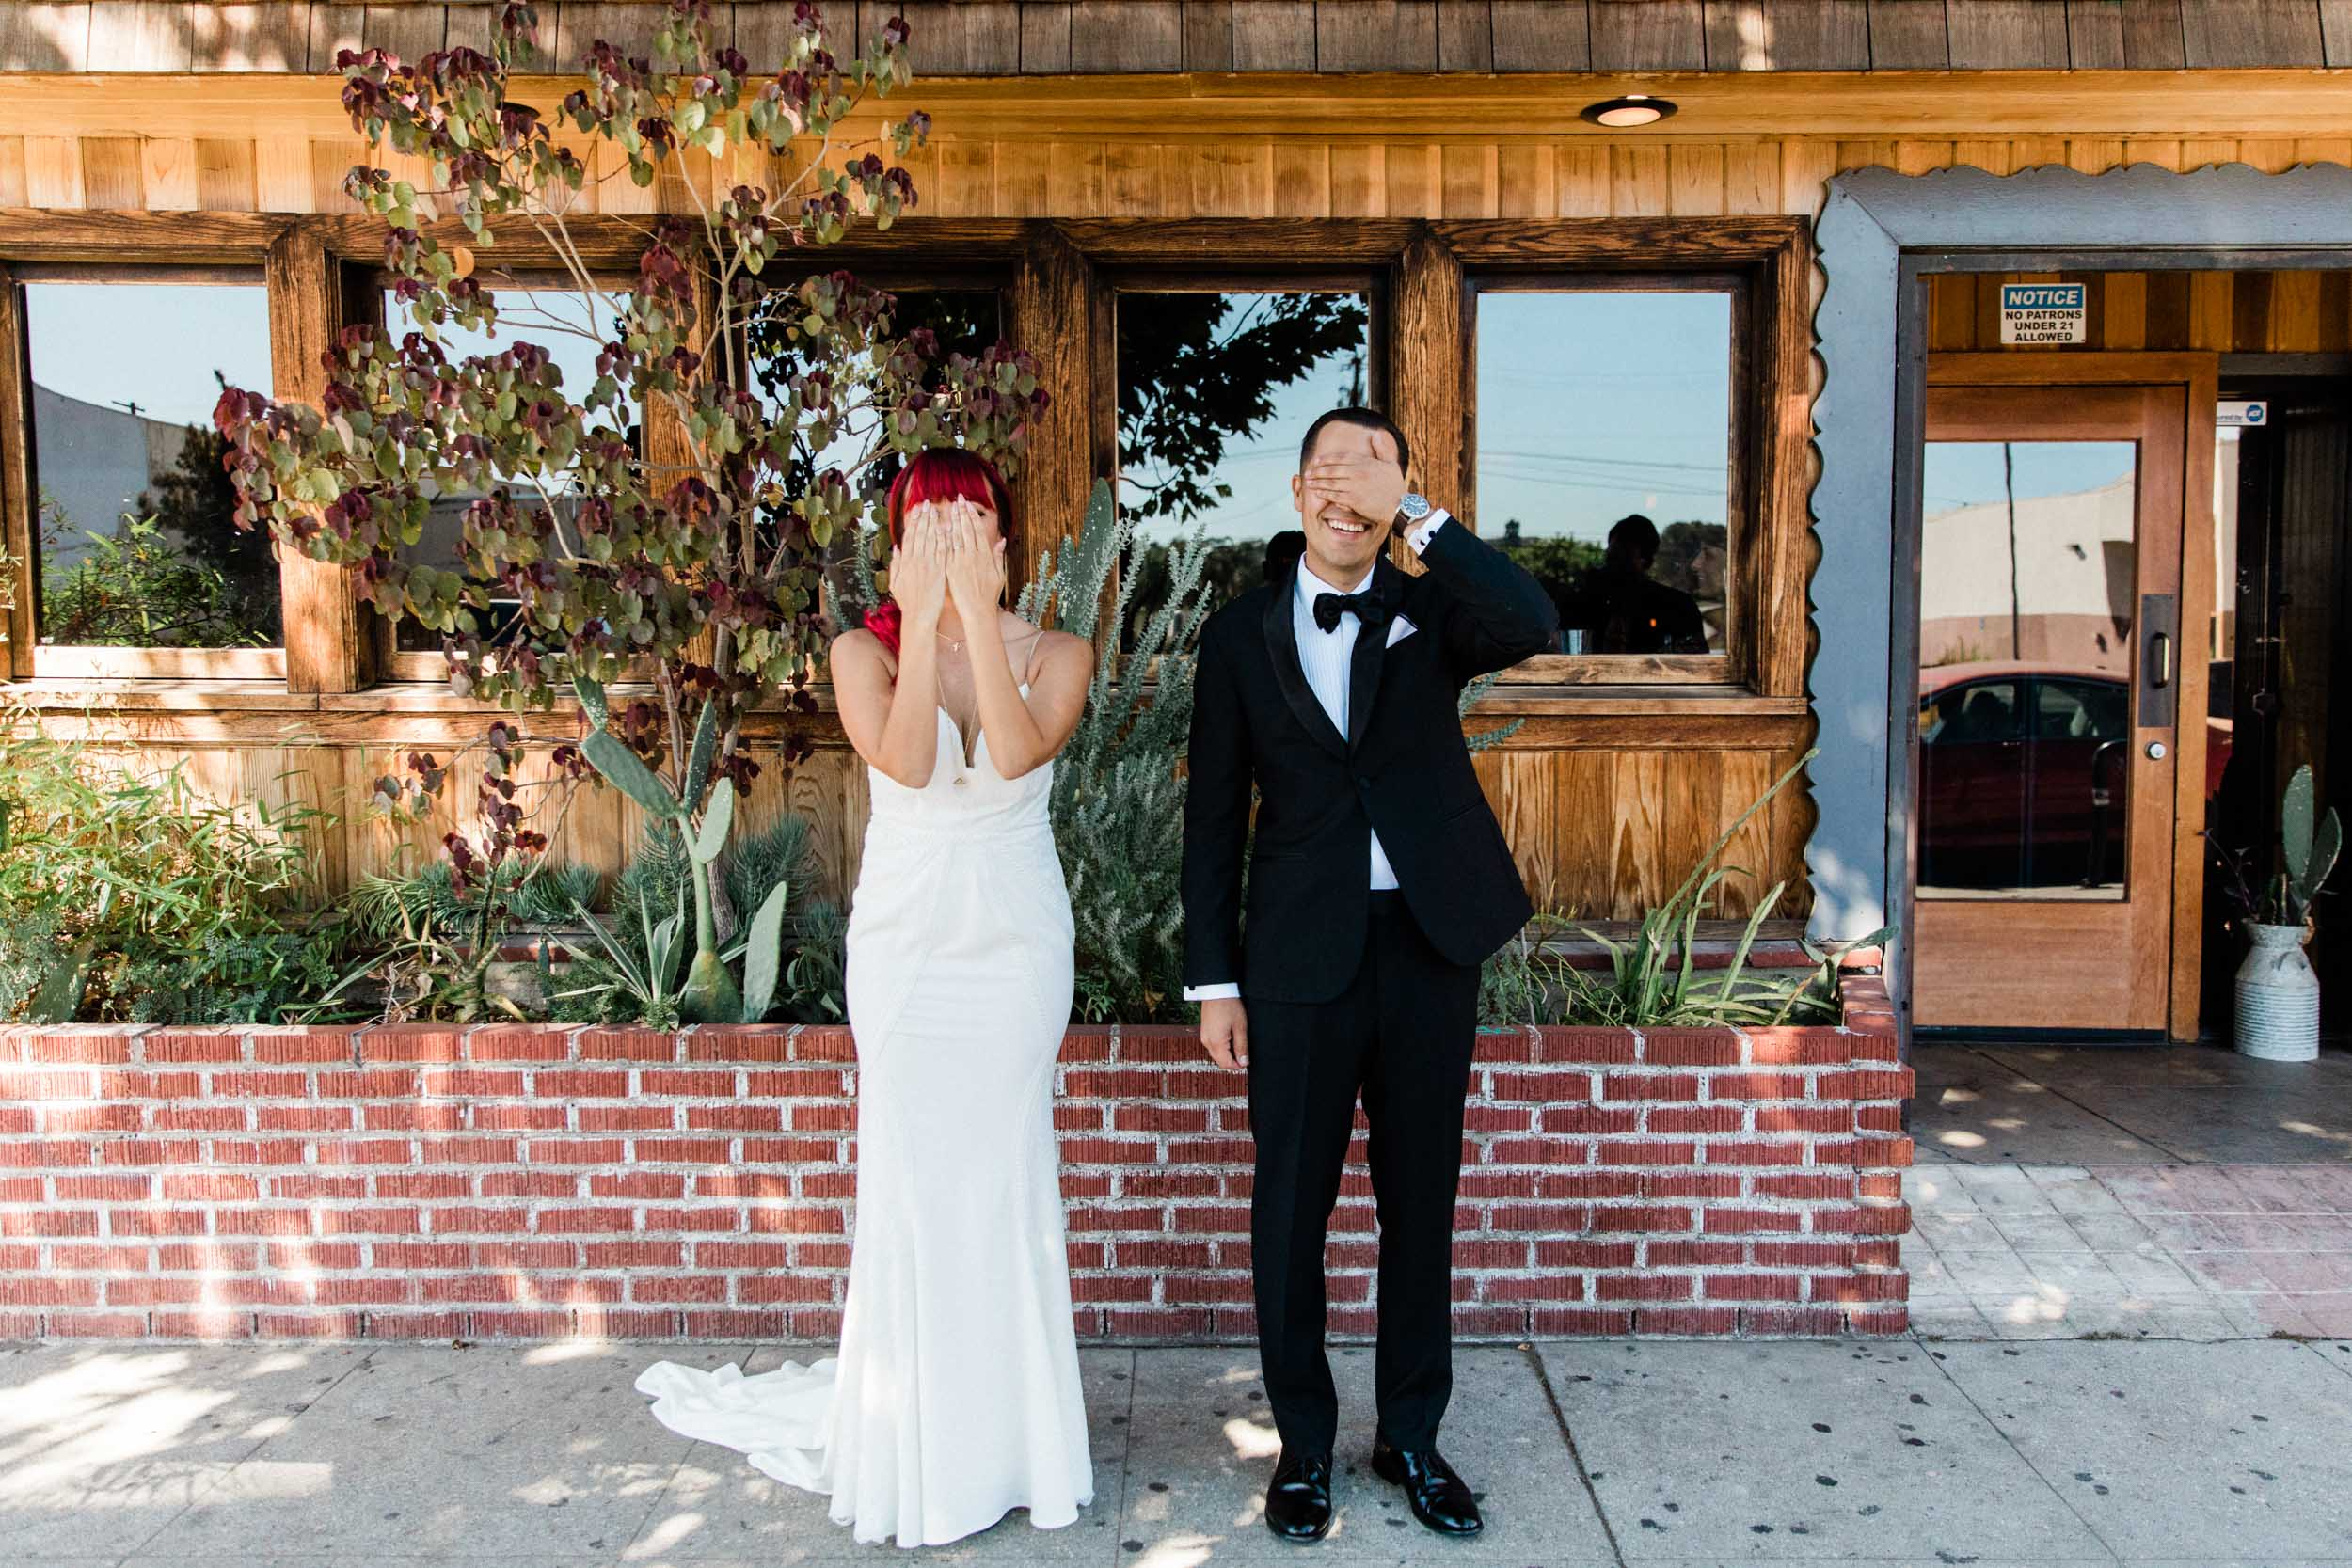 BKM-Photography-Los-Angeles-Highland-Park-York-Manor-Wedding-Photography-0209.jpg